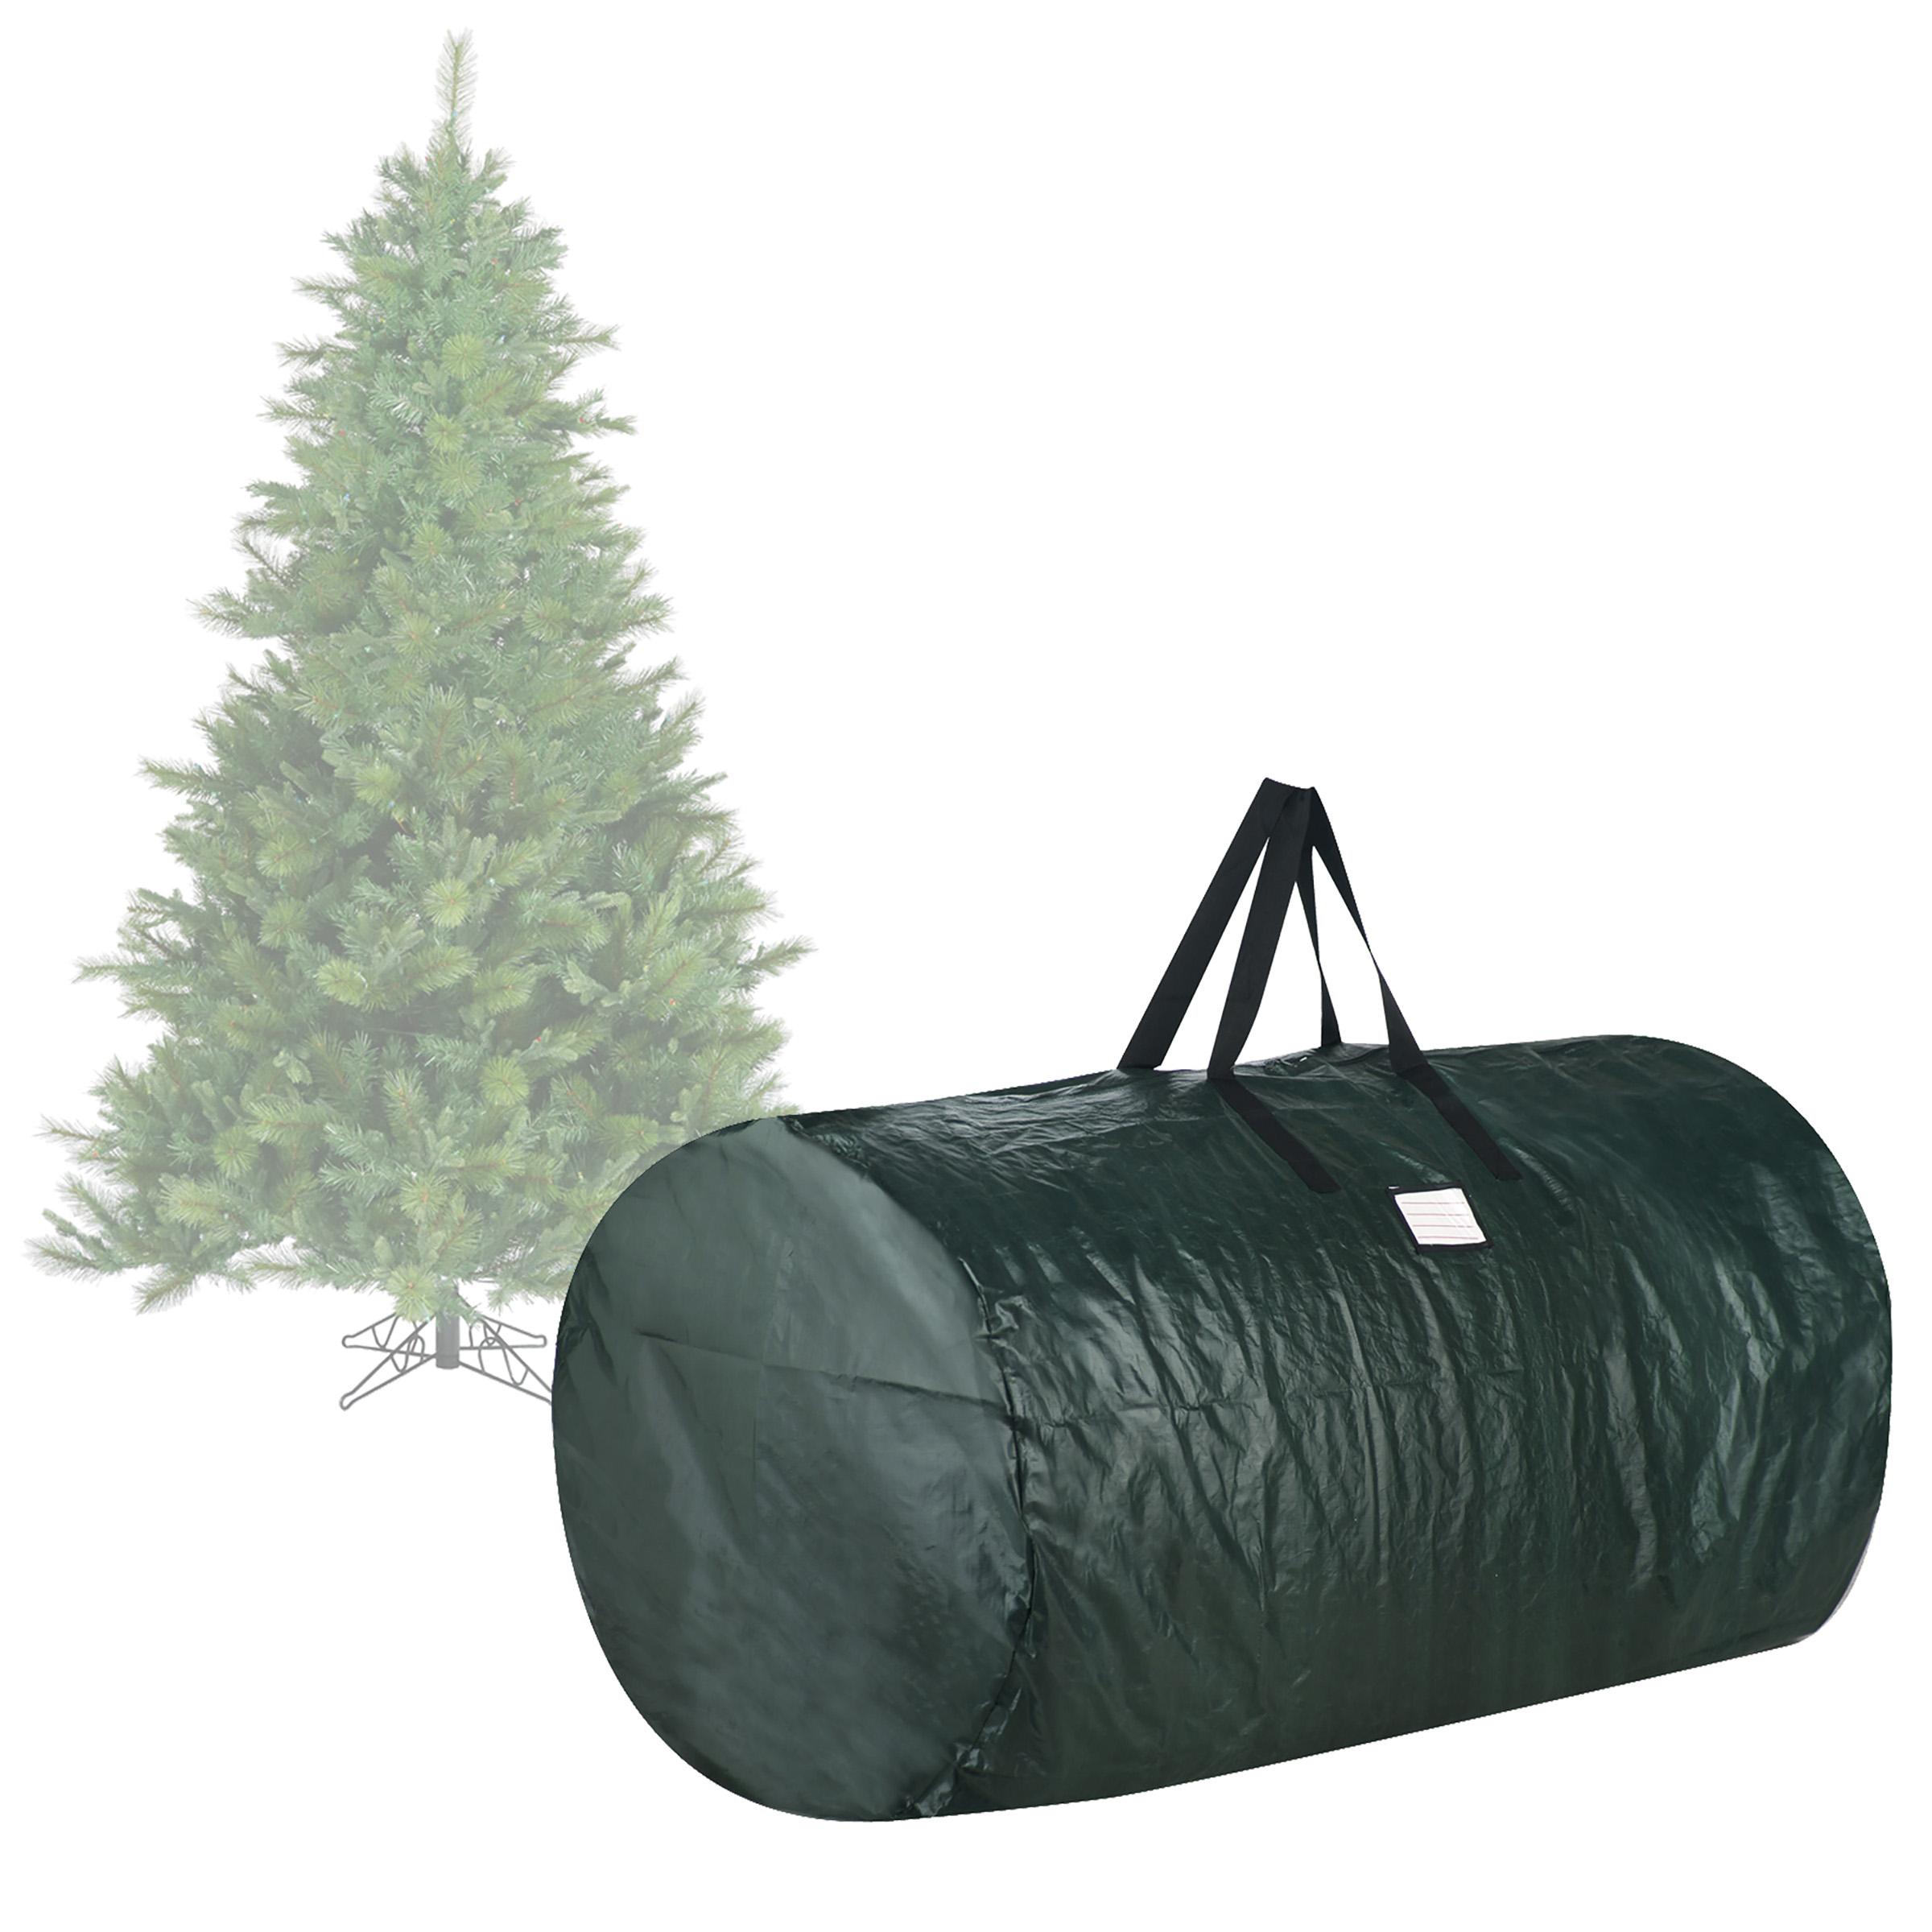 Elf Stor Premium Christmas Tree Bag Holiday Green Large For 7.5 Ft Tree